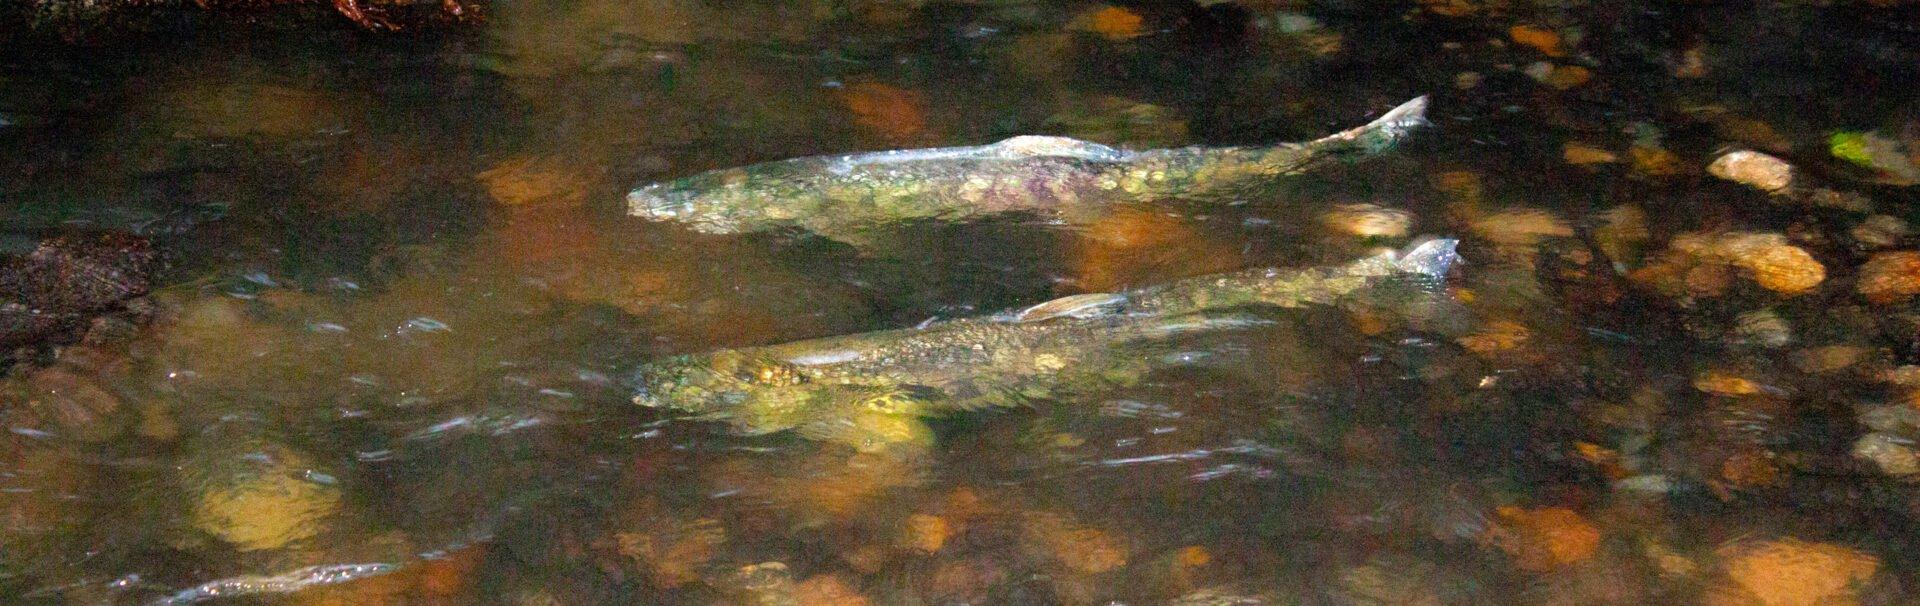 Where To See The Salmon Run